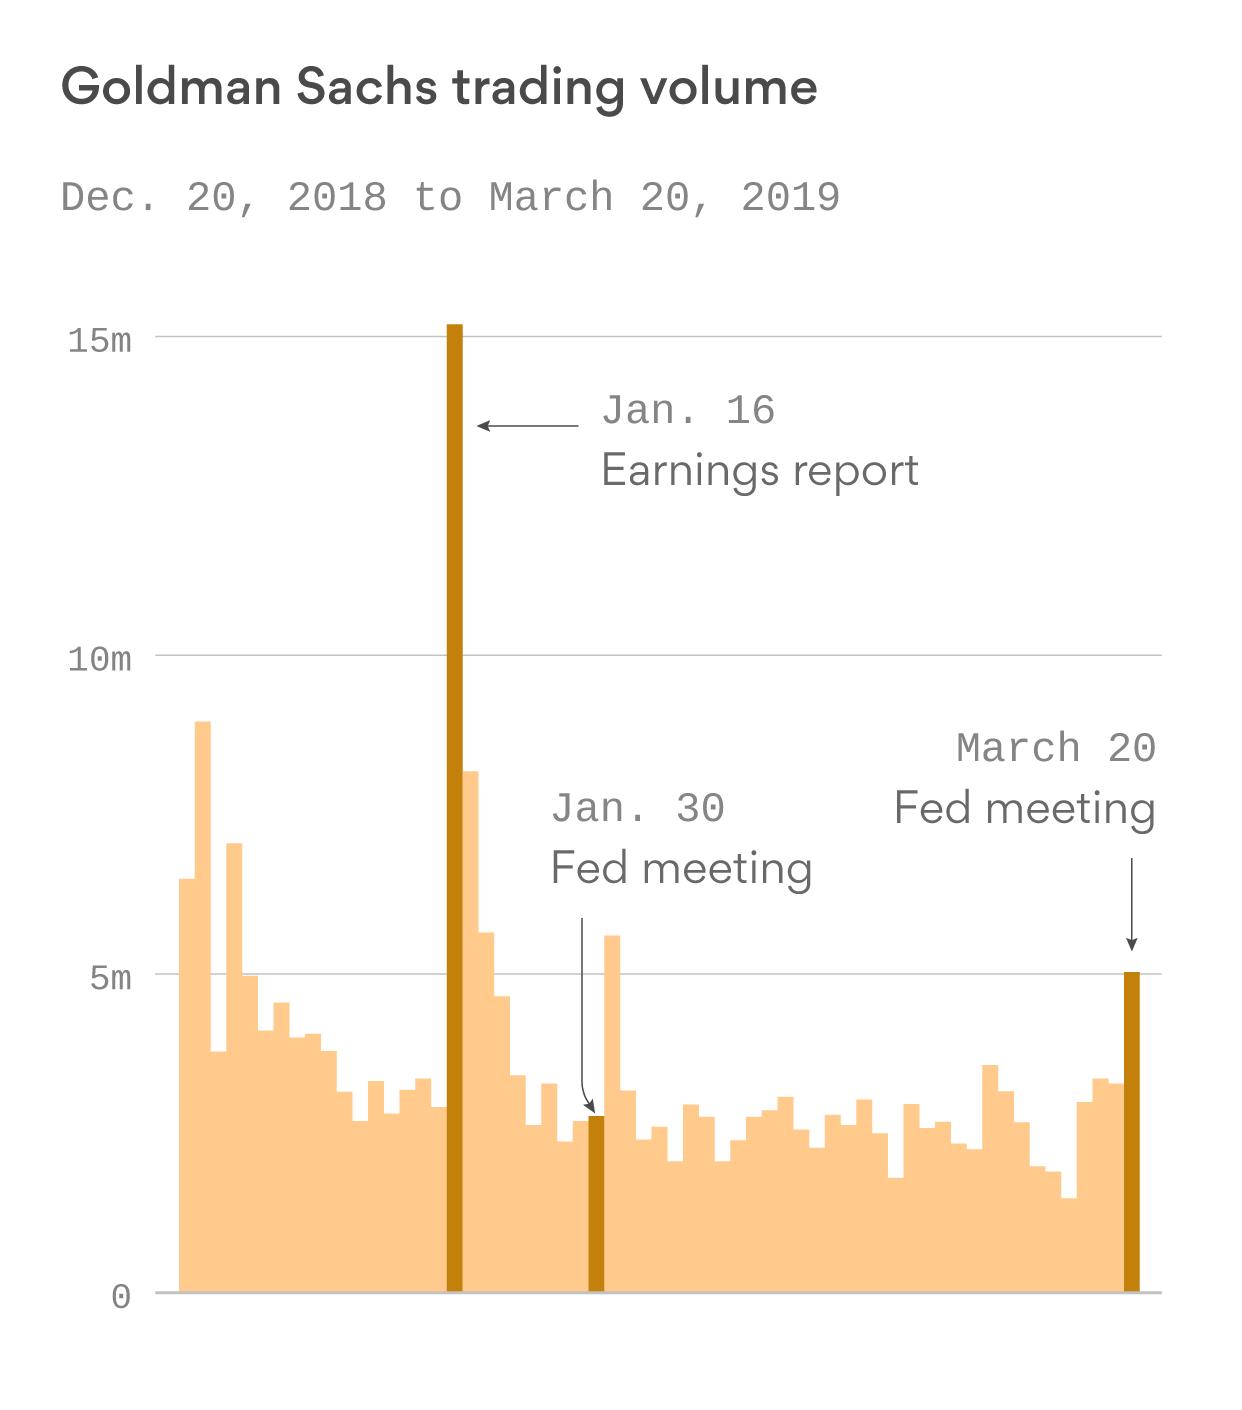 Bank stocks face big losses on big trading volumes, with Goldman Sachs at the bottom